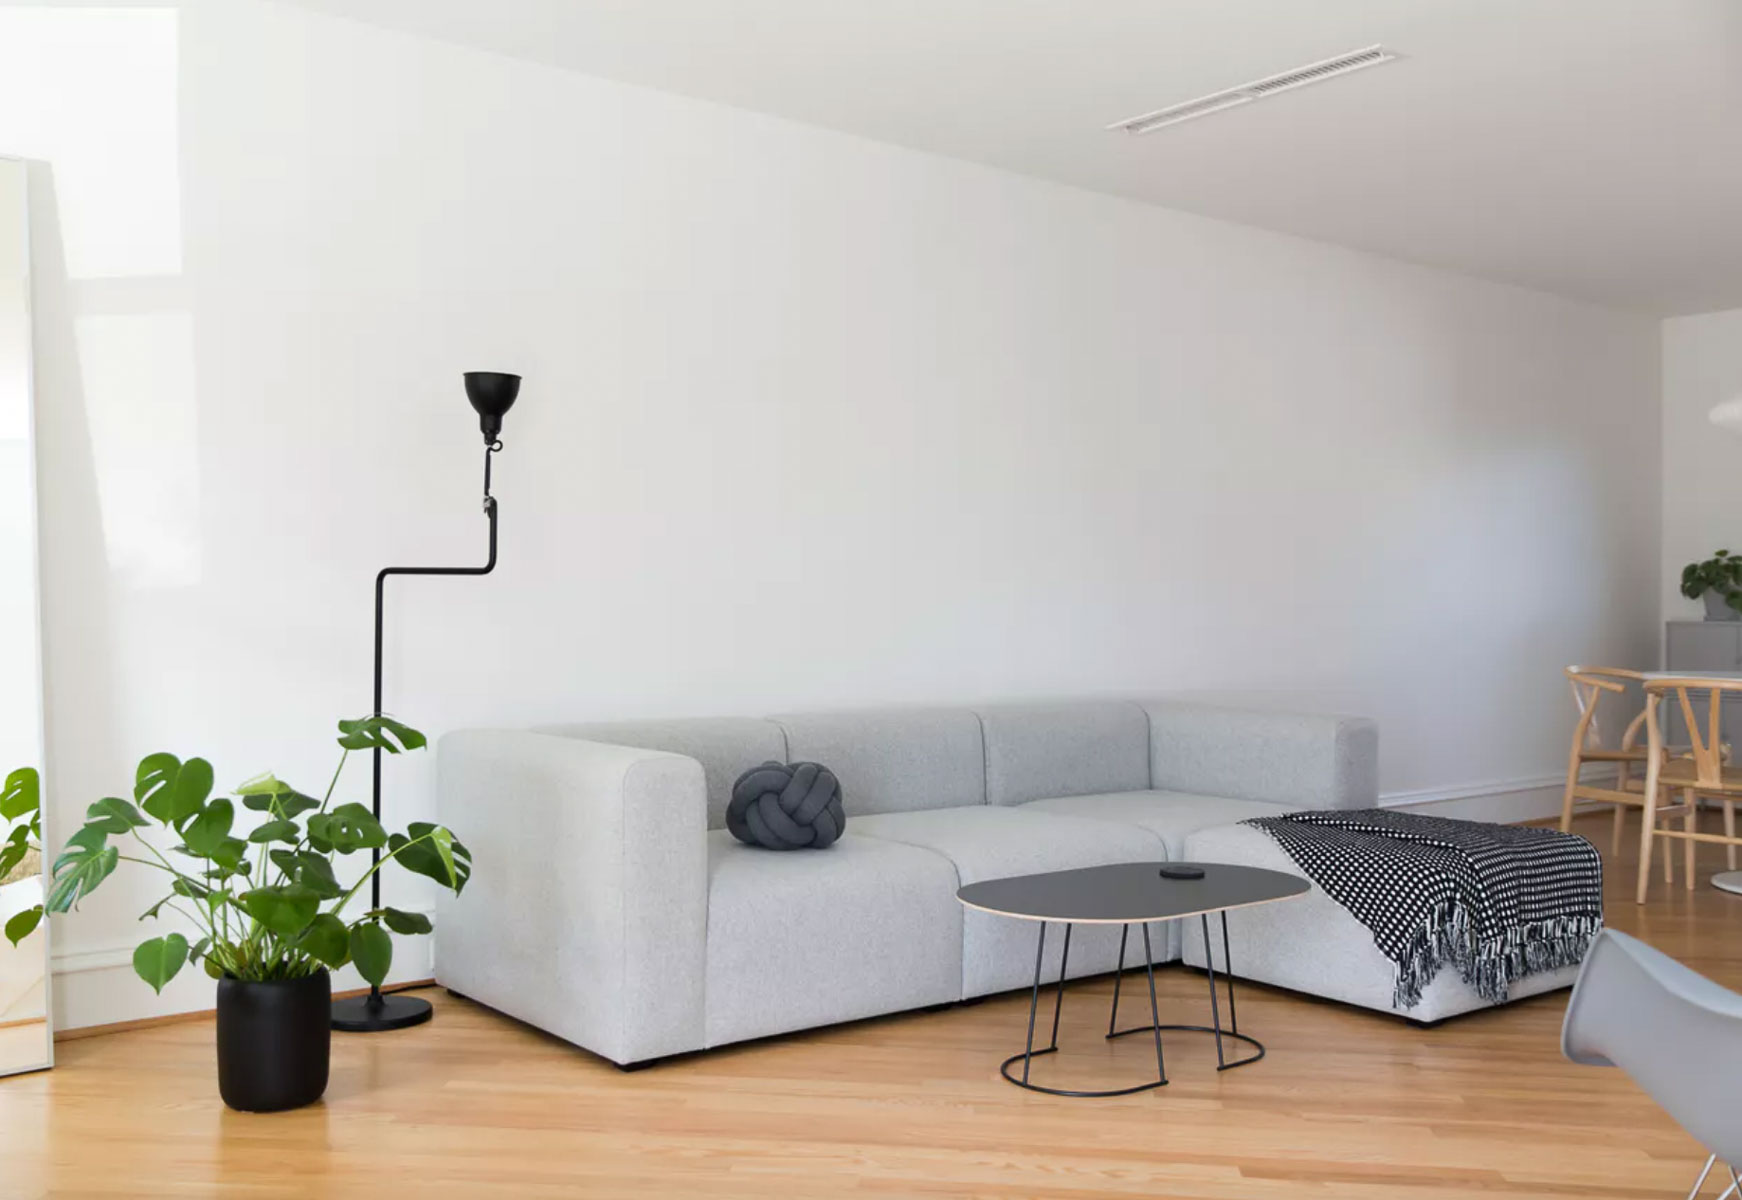 minimal-rowhouse_richmond-virginia-natural-light-photoshoot-location-2.jpg